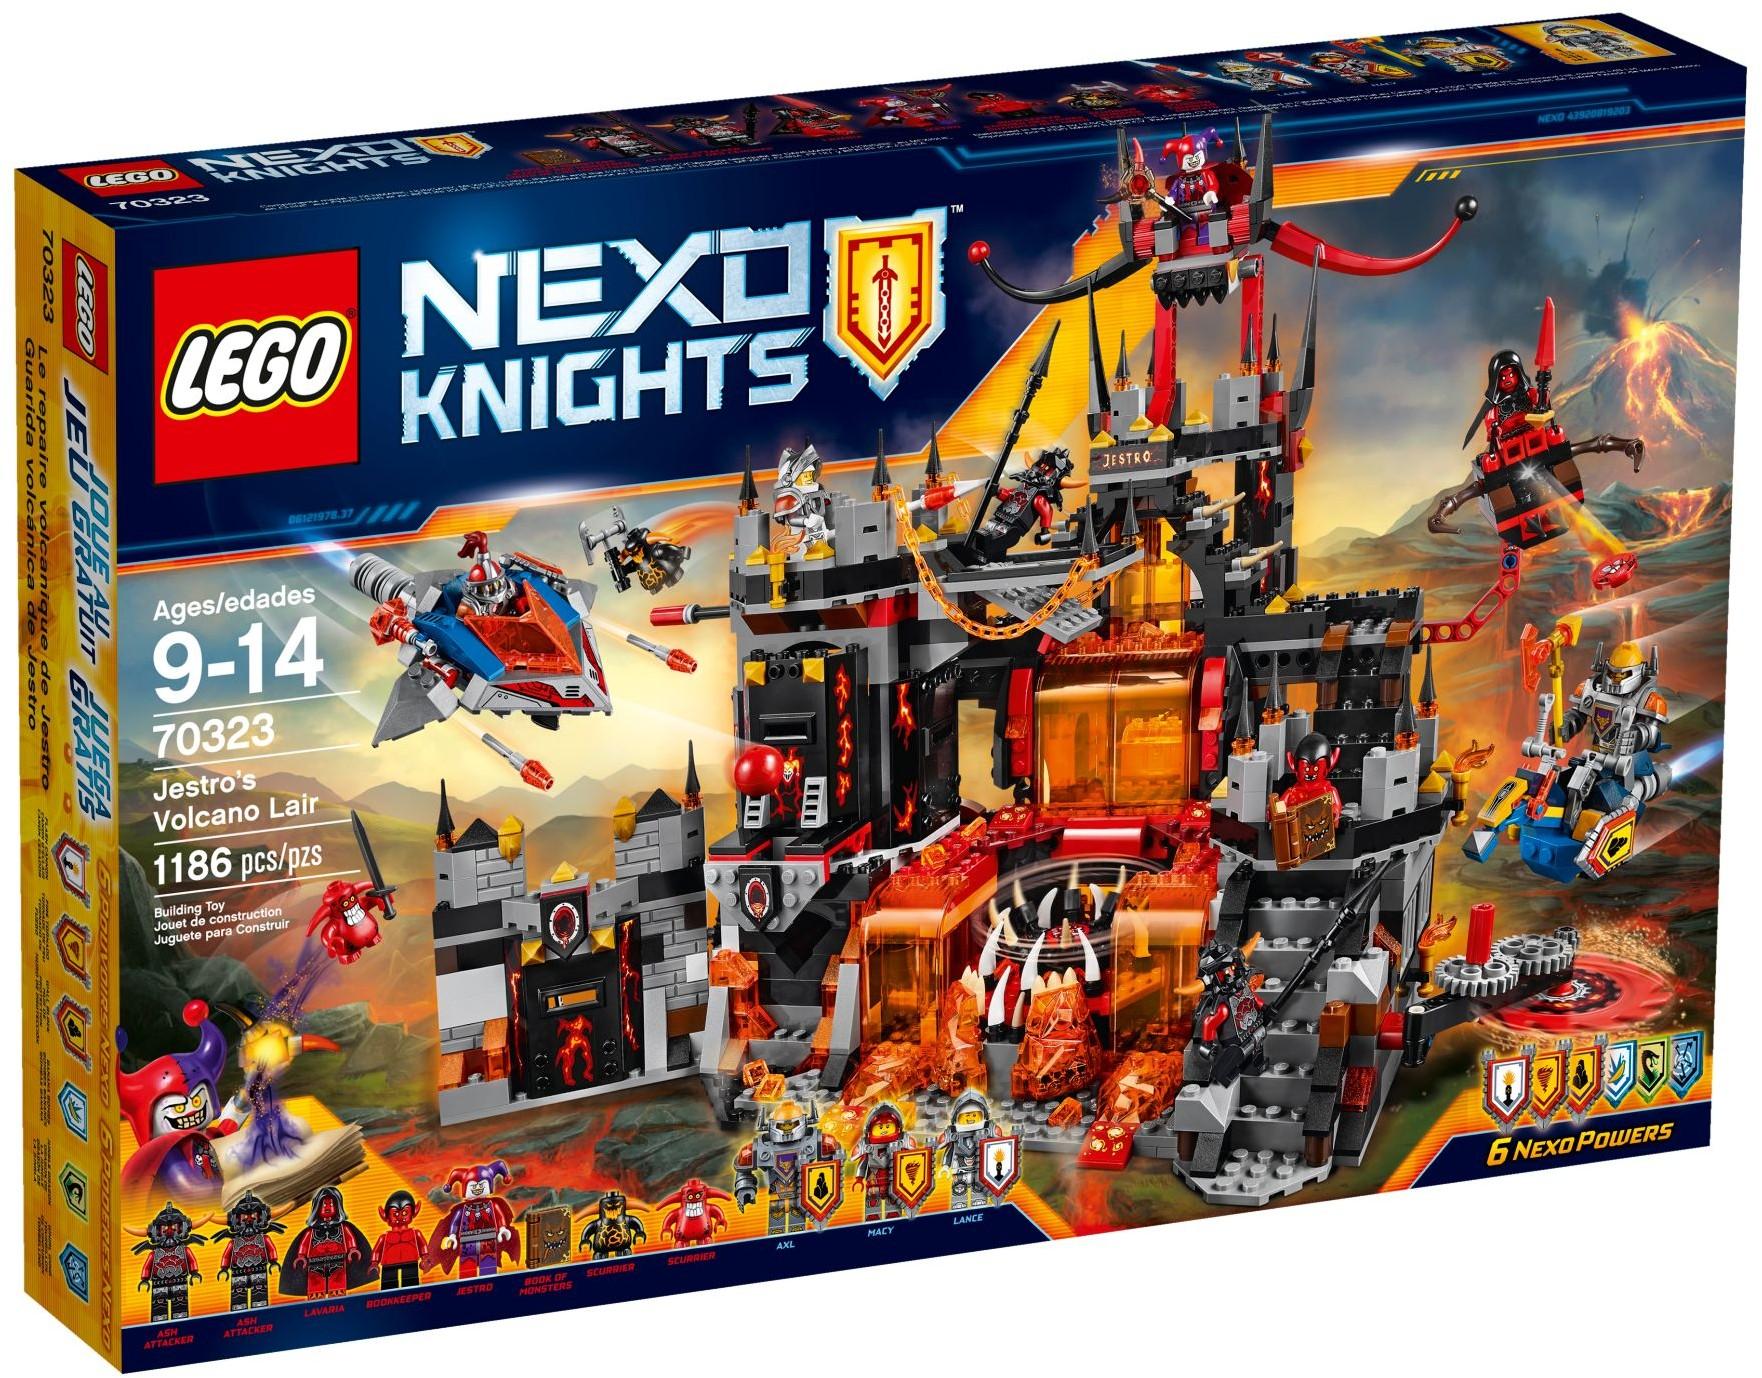 LEGO # 70323 NEXO KNIGHTS Jestros Volcano Lair